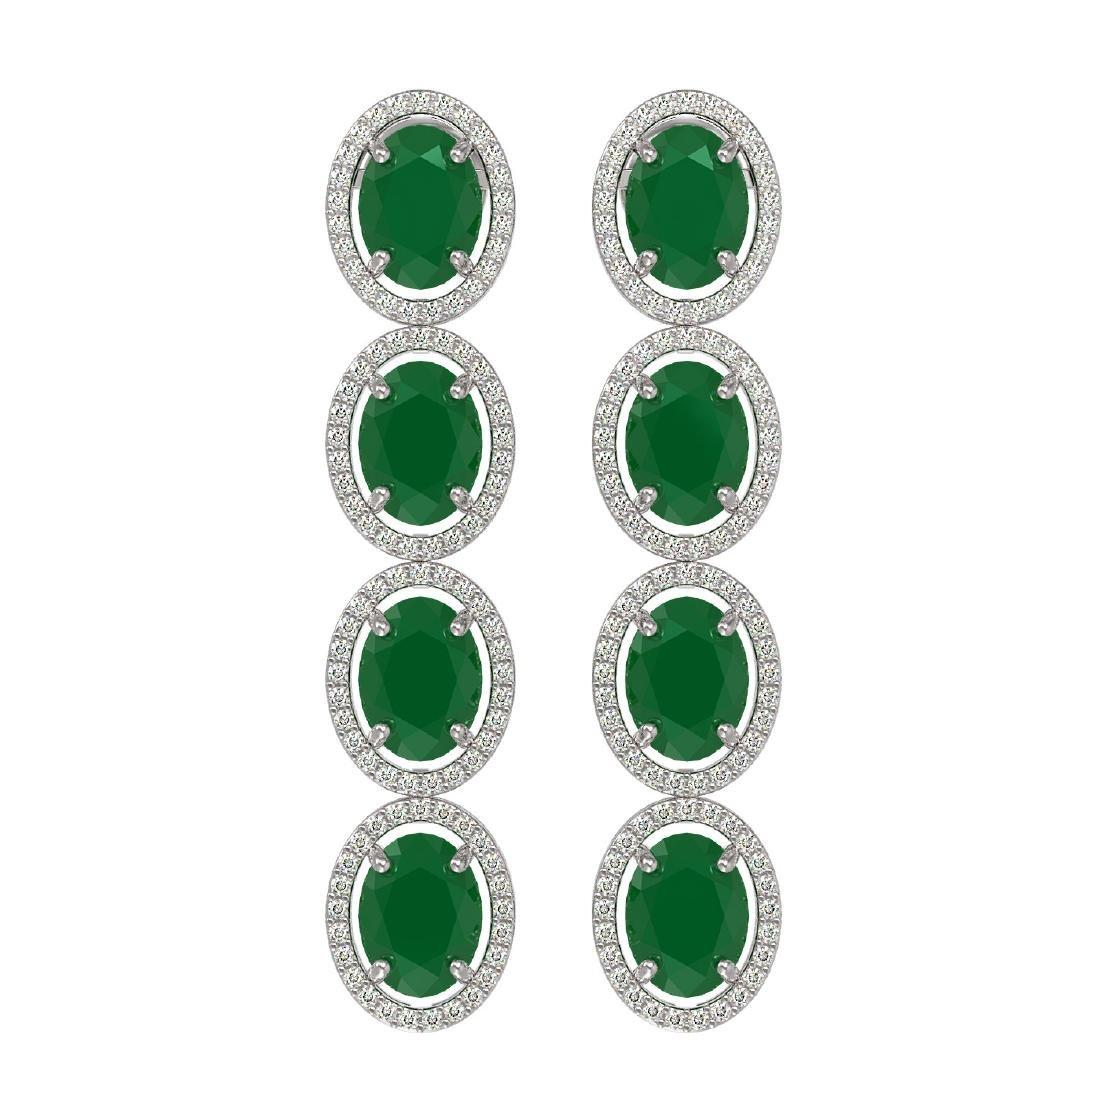 15.68 ctw Emerald & Diamond Halo Earrings 10K White